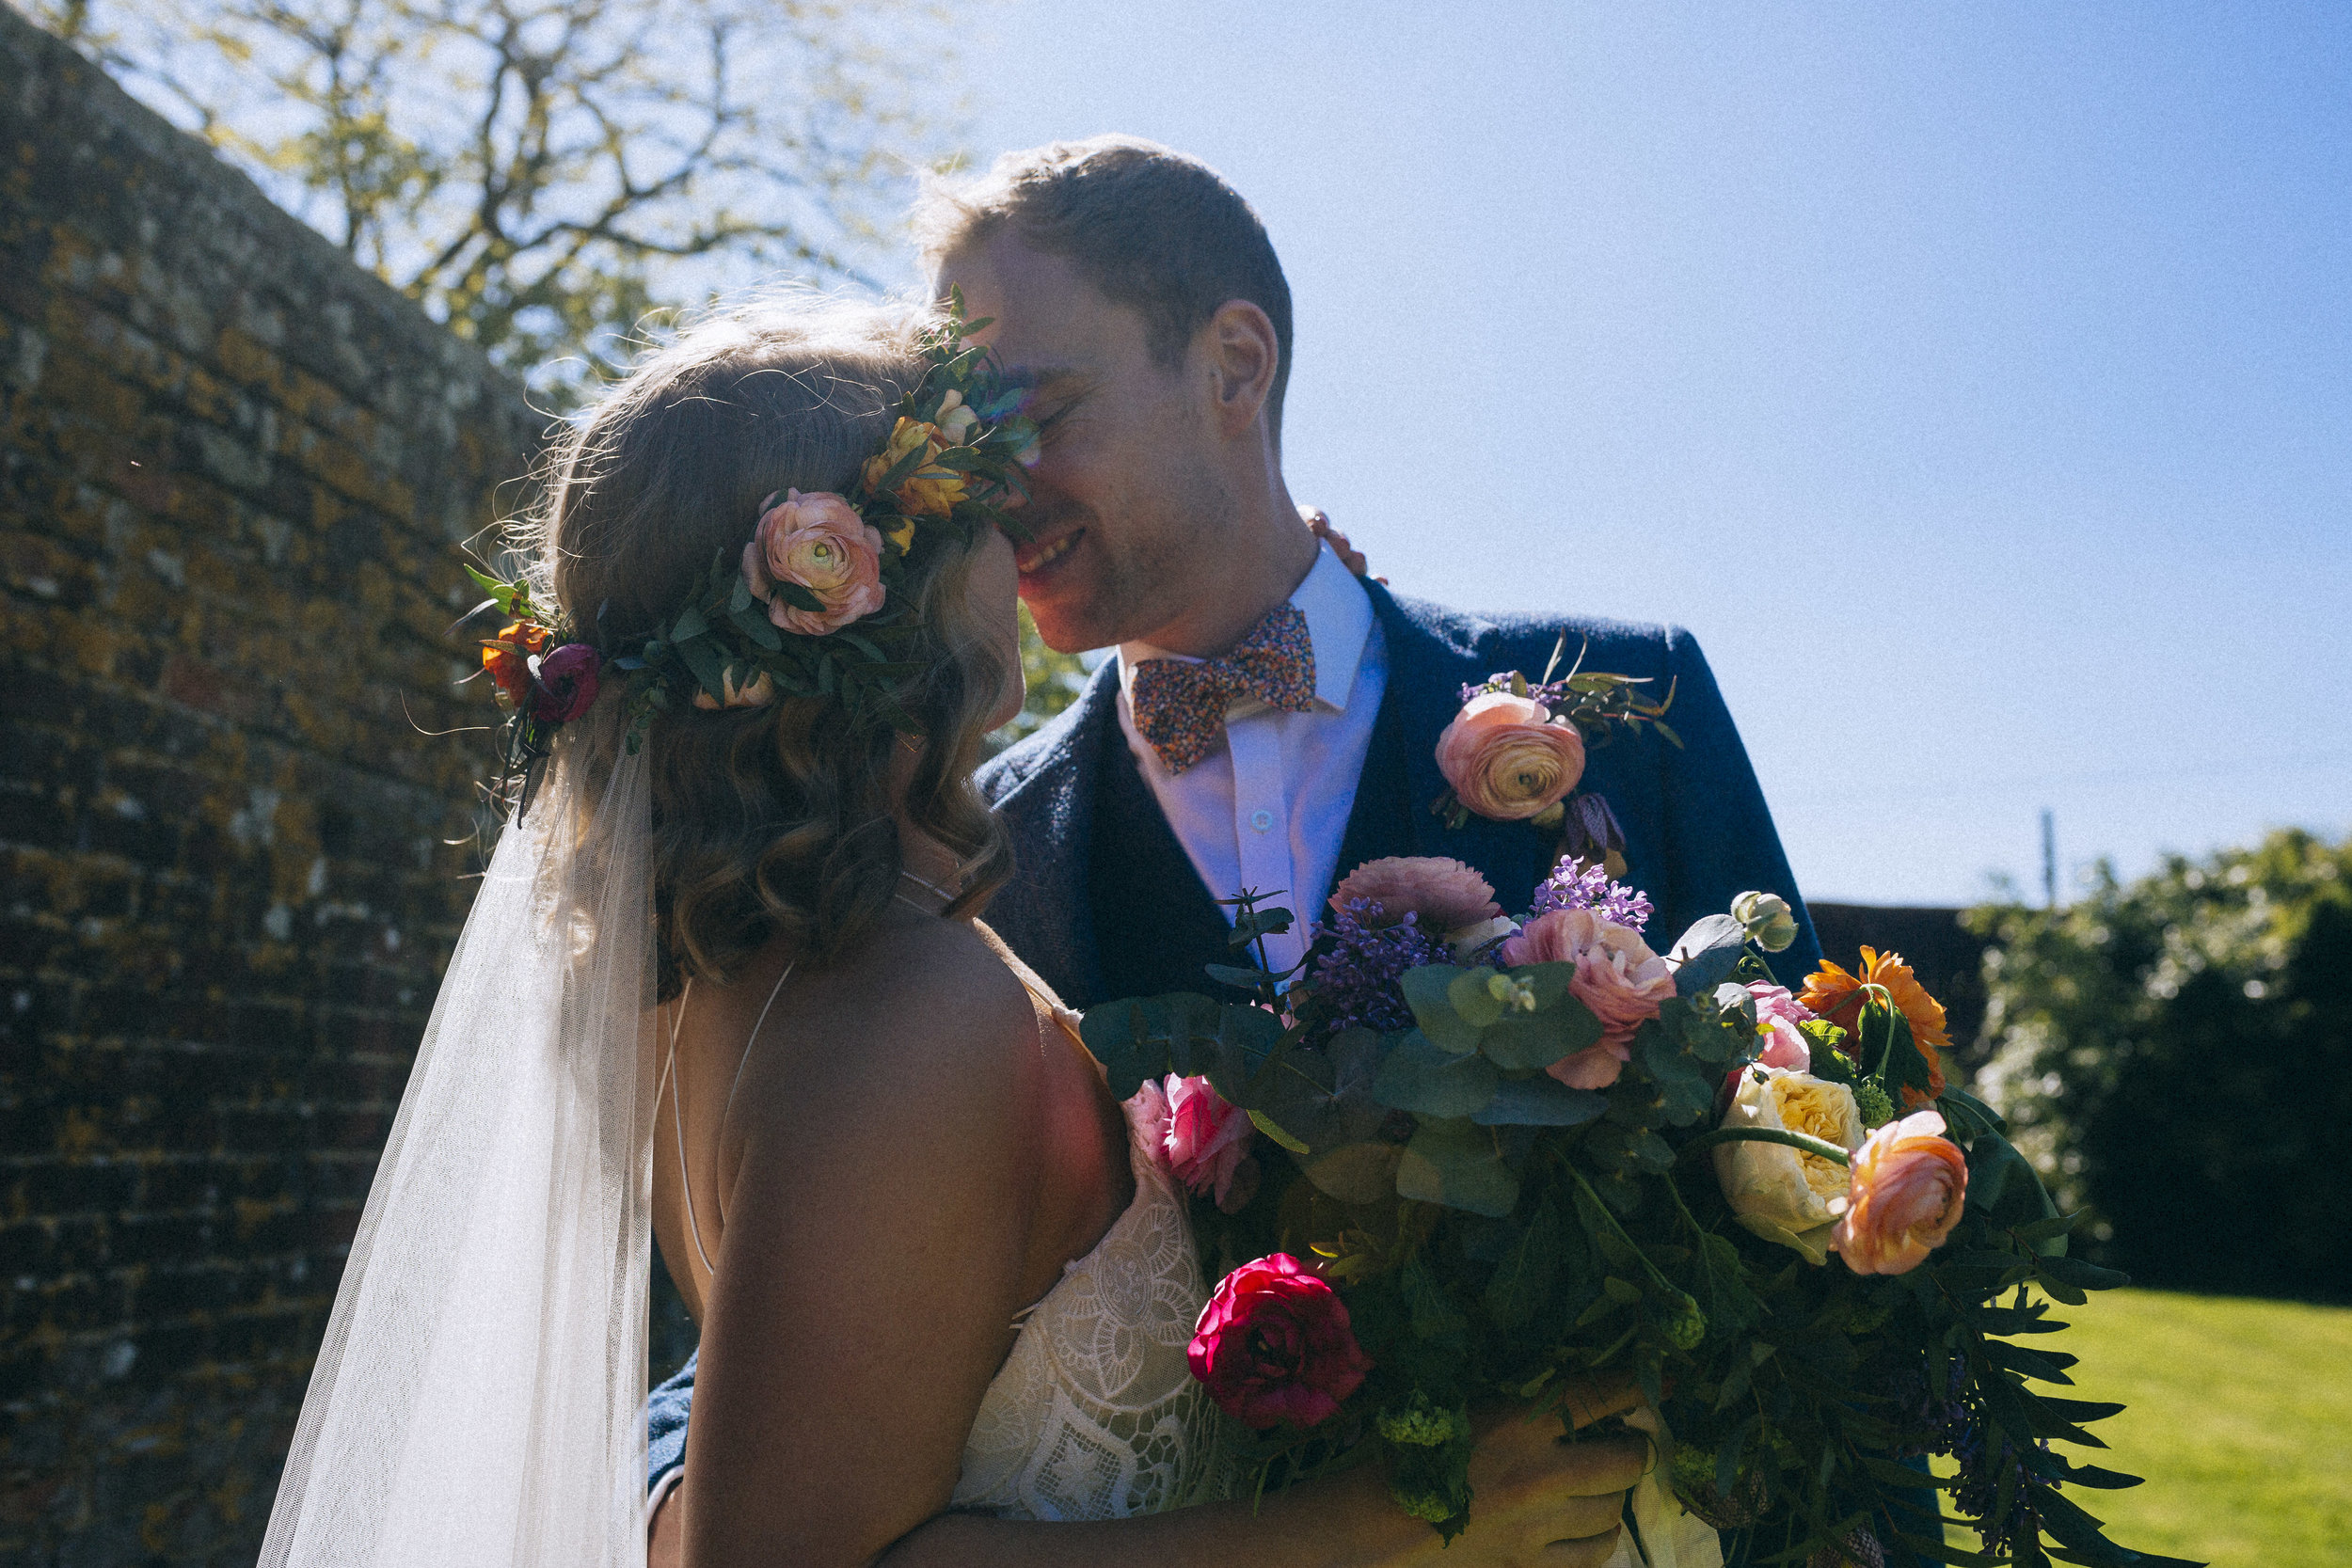 ROS & CHRIS - COLOURFUL RELAXED BARN WEDDING | BRIGHTON